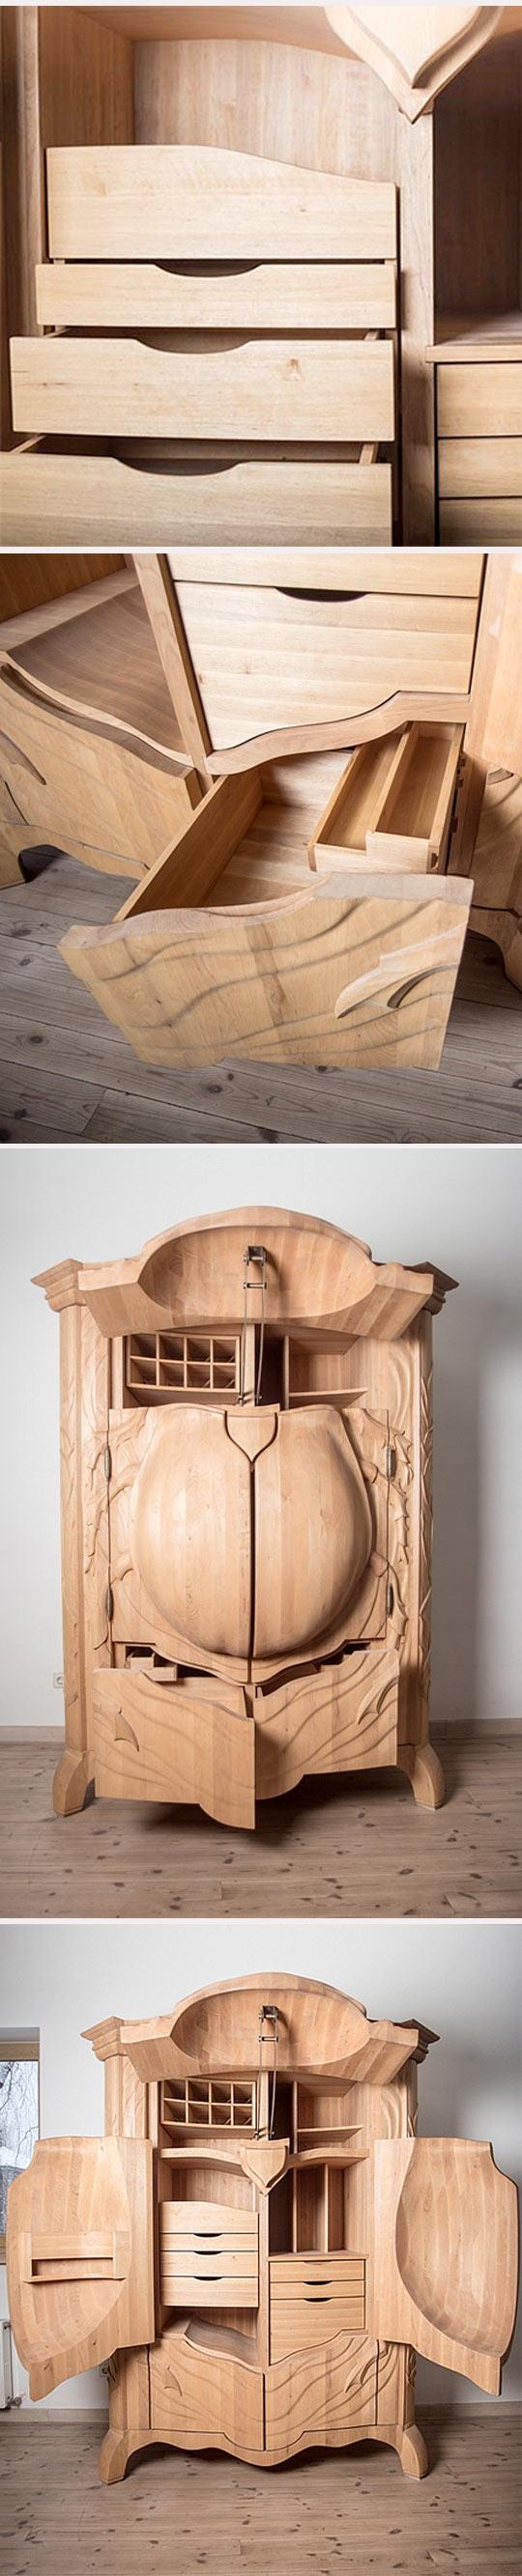 cool-wood-beetle-cabinet-inside-closet